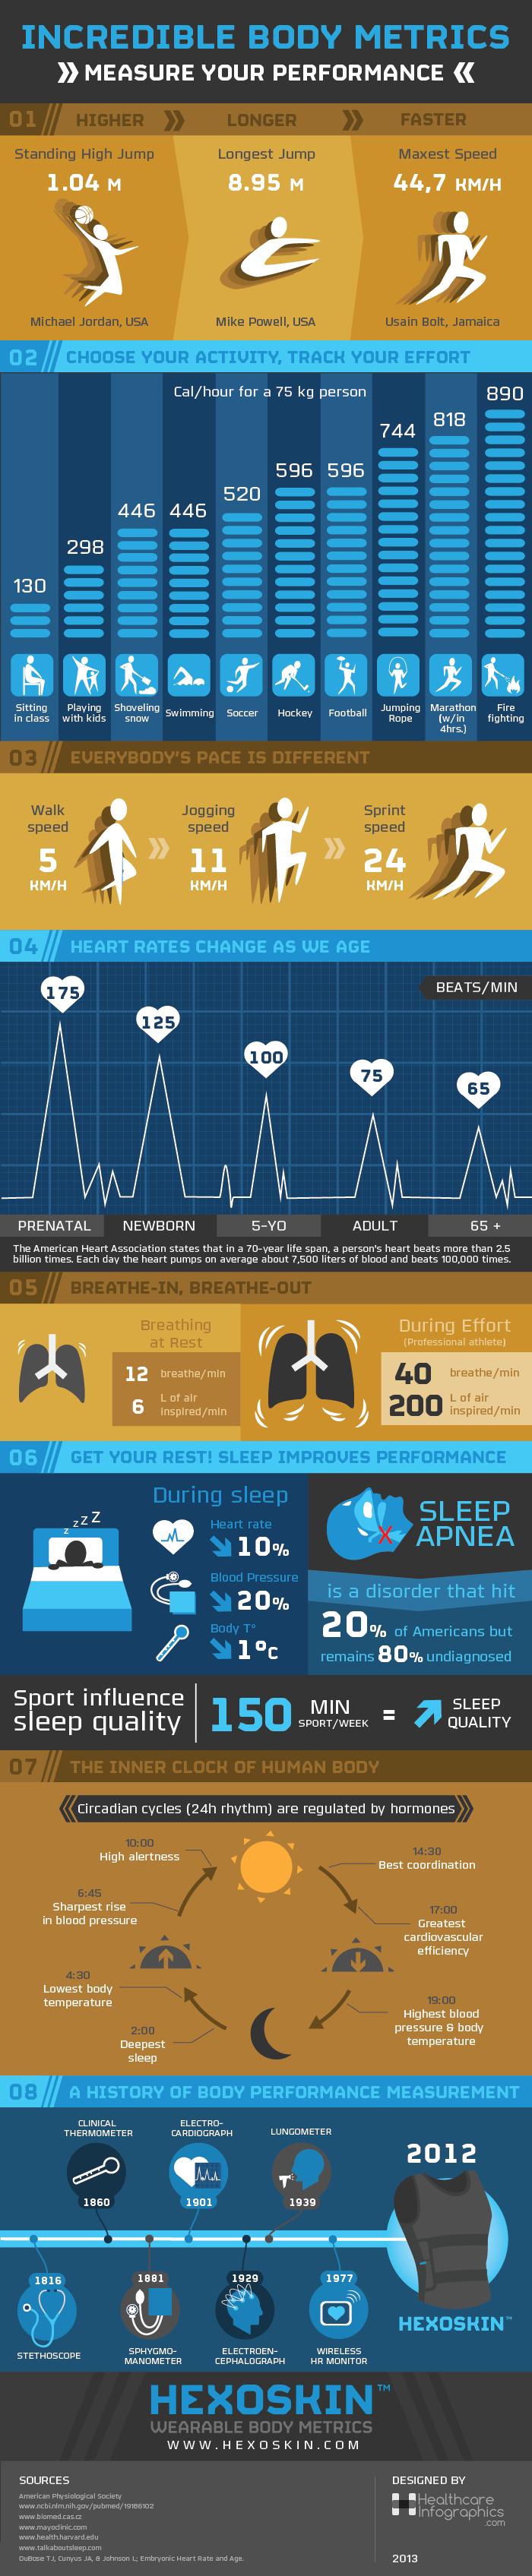 infographic-hexoskin-web-final